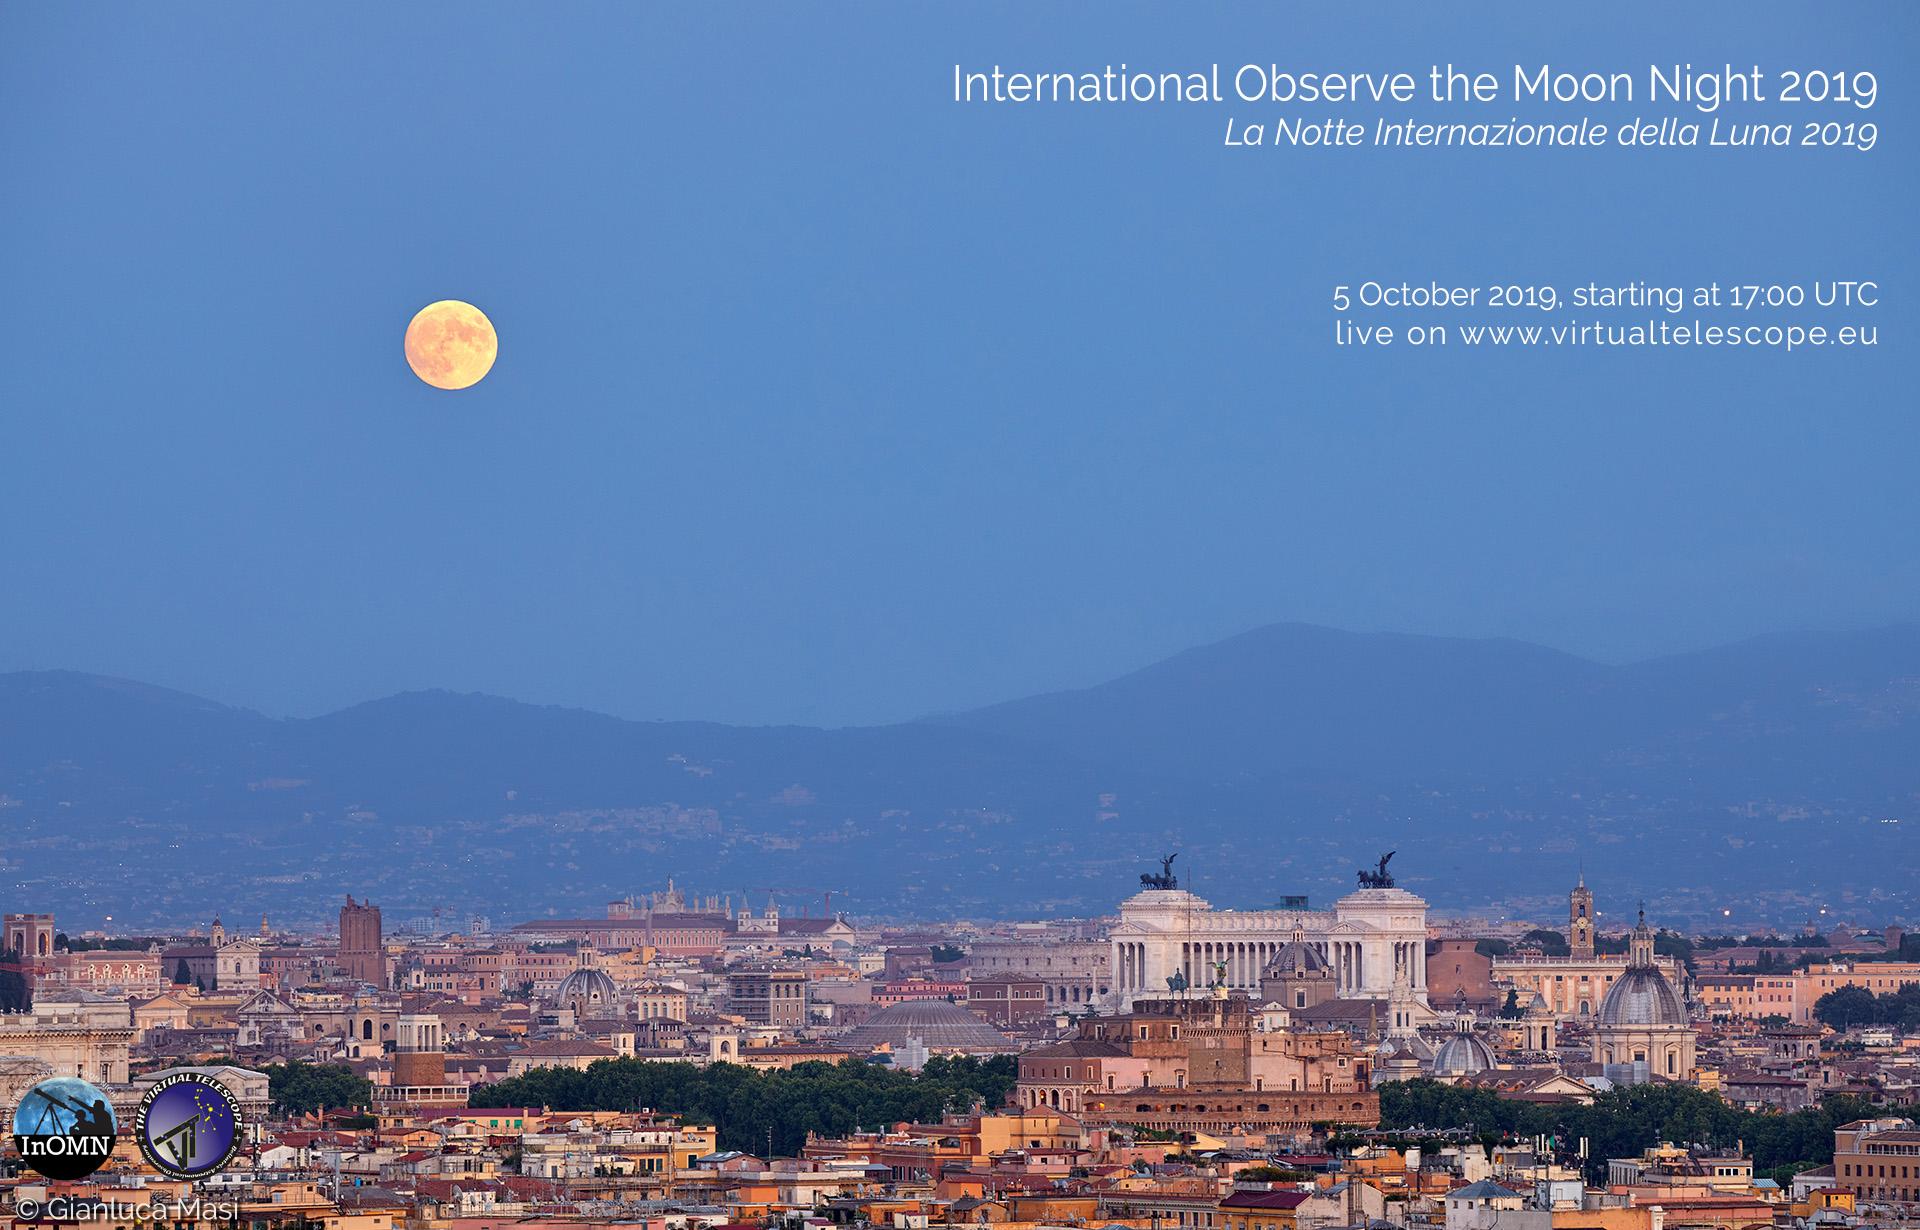 International Observe the Moon Night 2019: online observation - 5 Oct. 2019